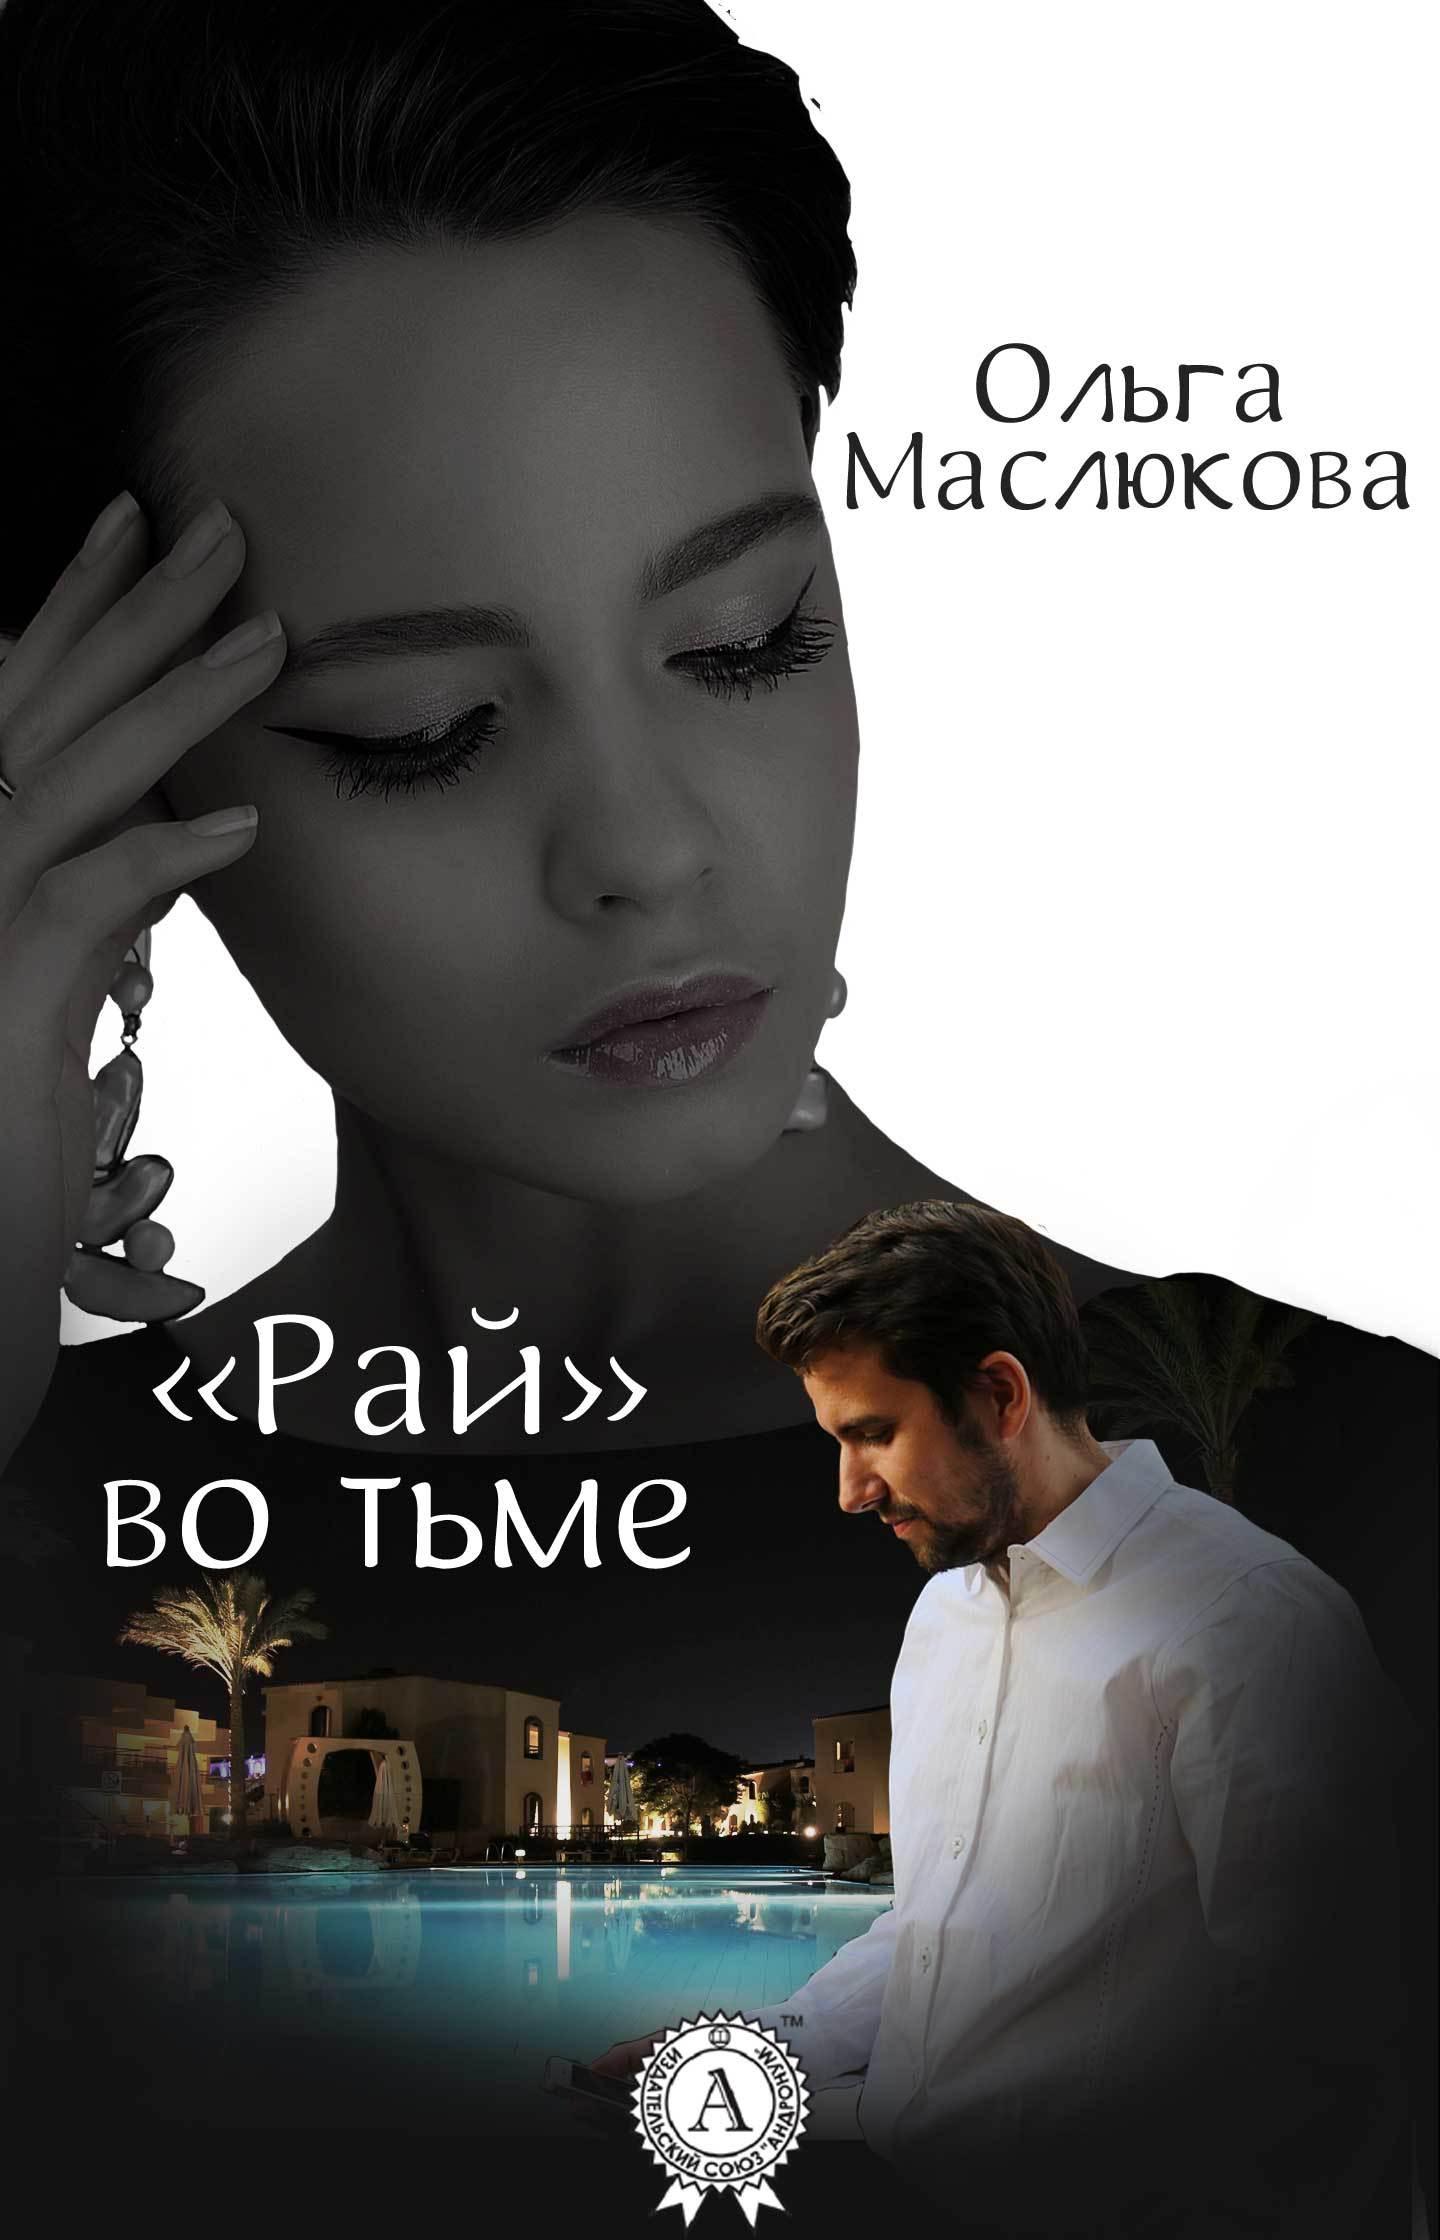 Ольга Маслюкова ««Рай» во тьме»